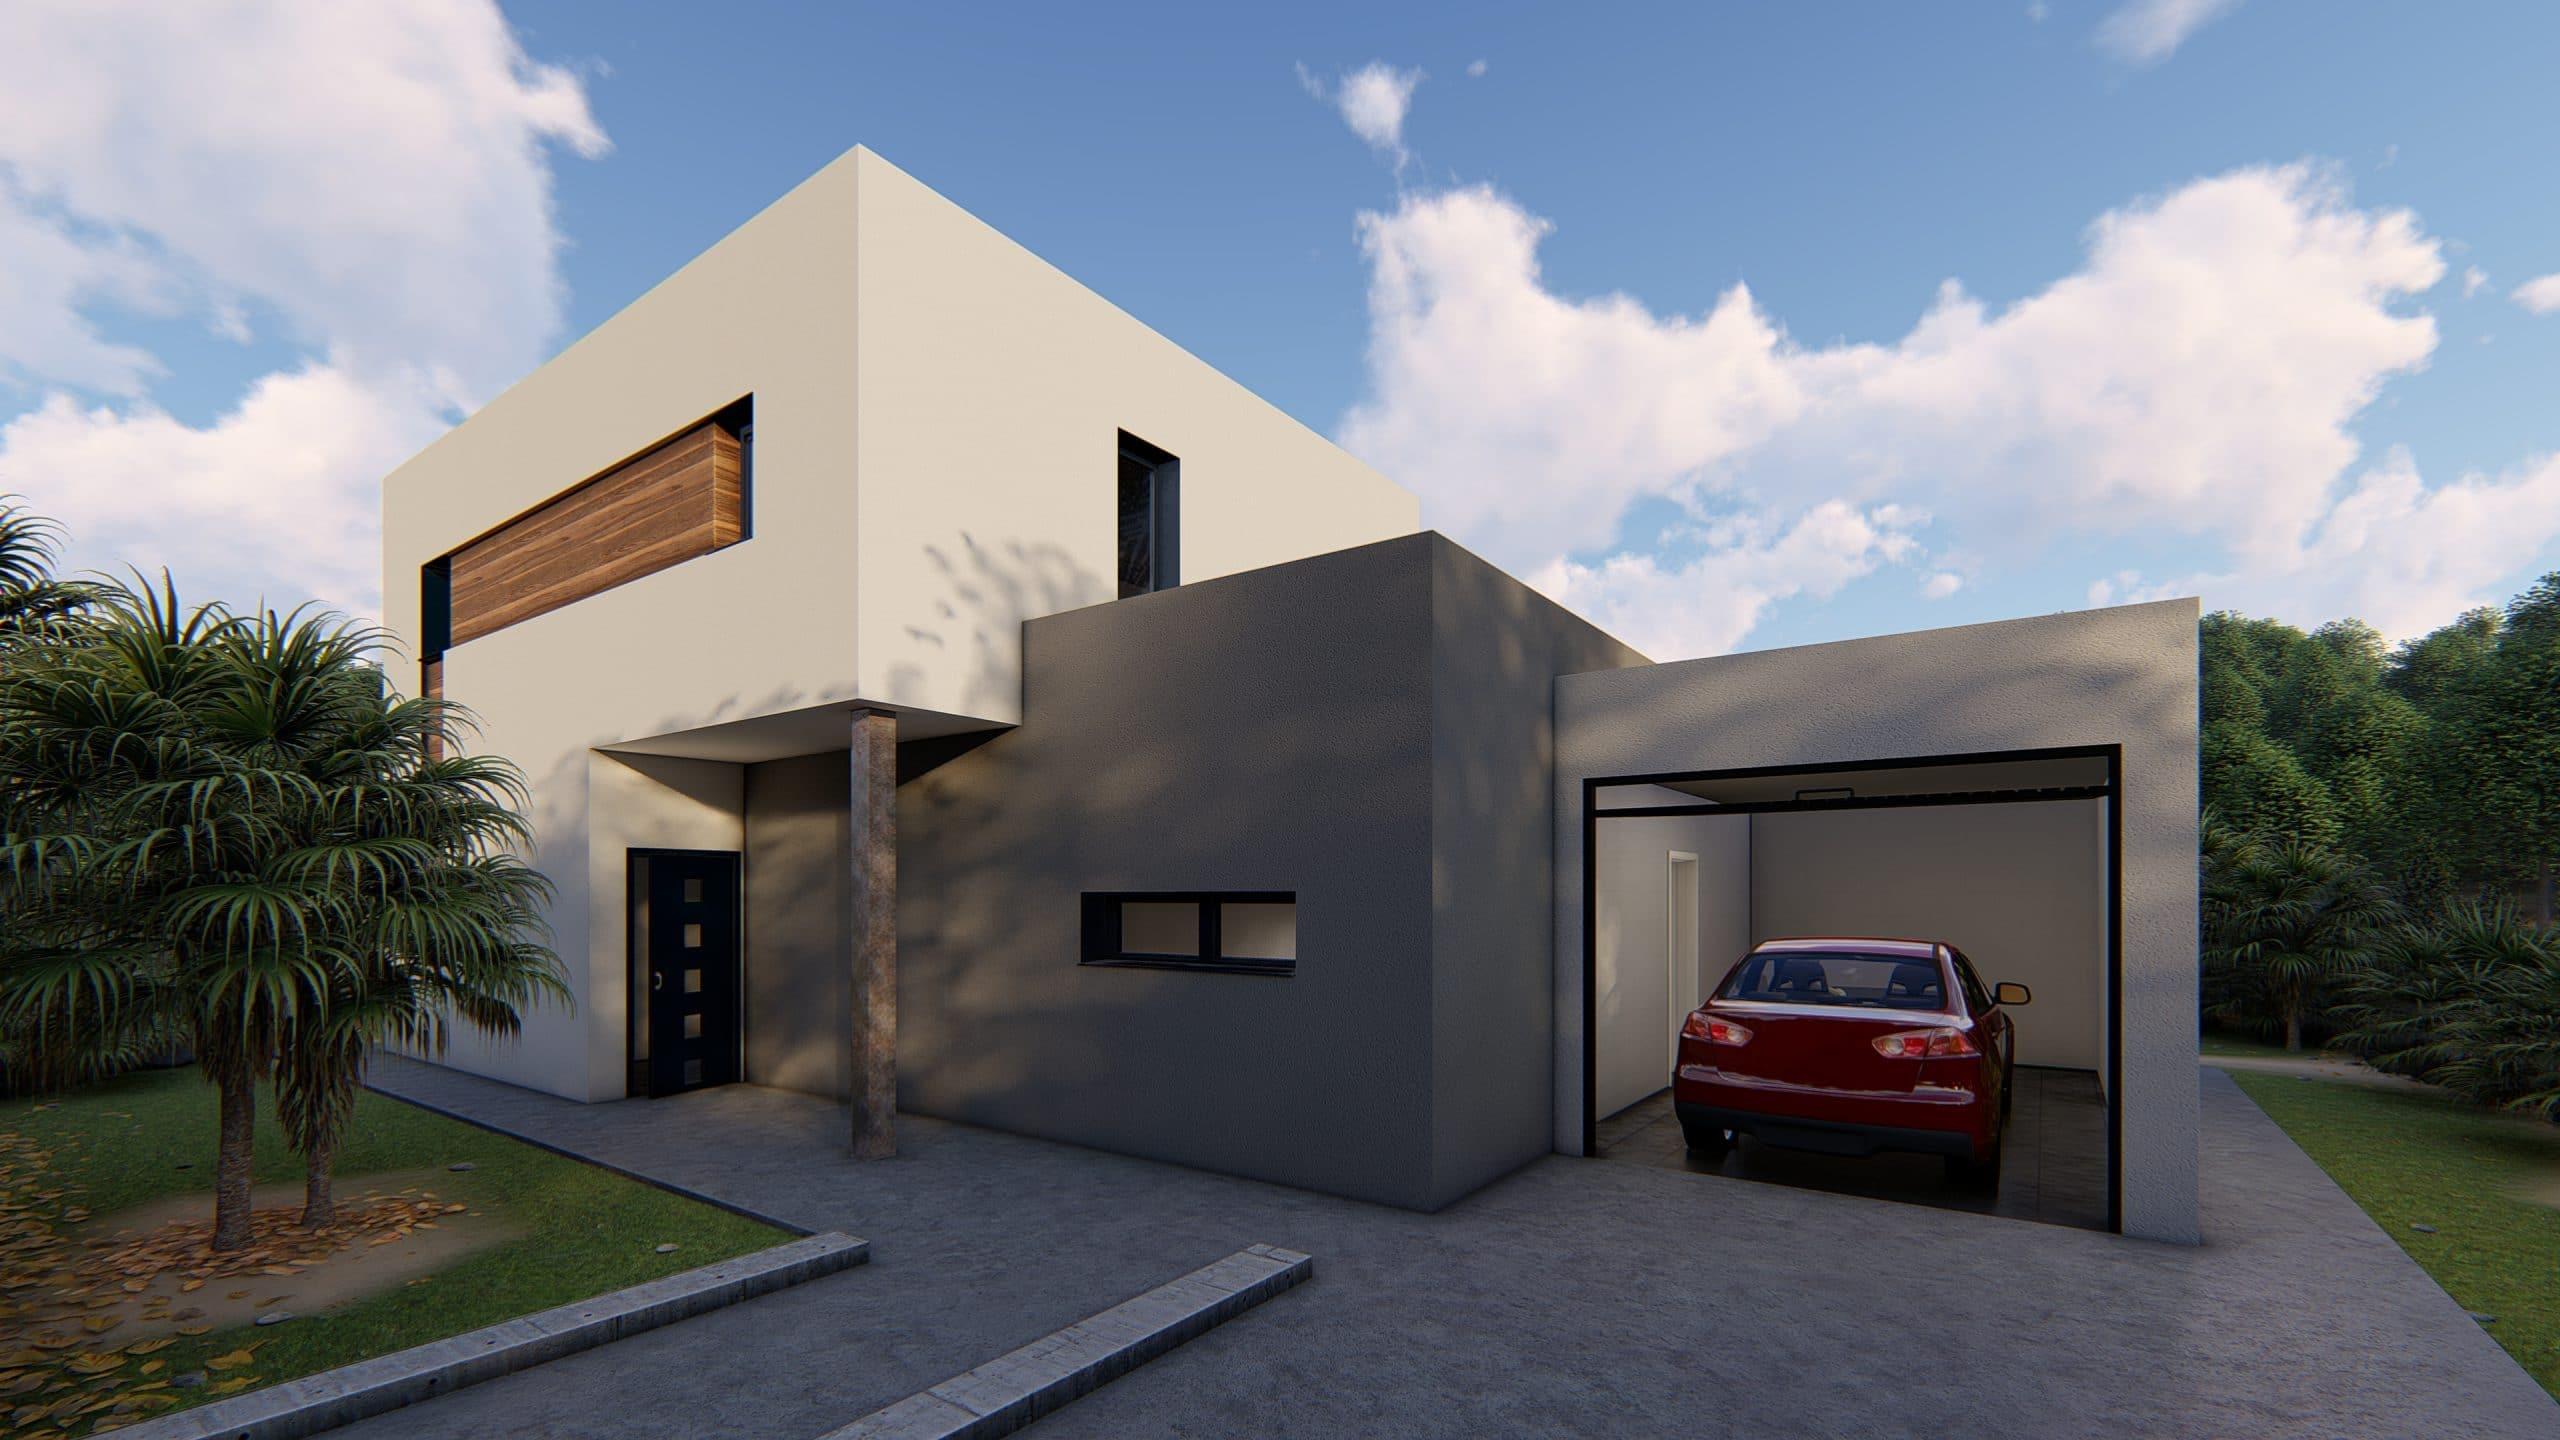 Casa prefabricada modelo Sant Cugat - exterior